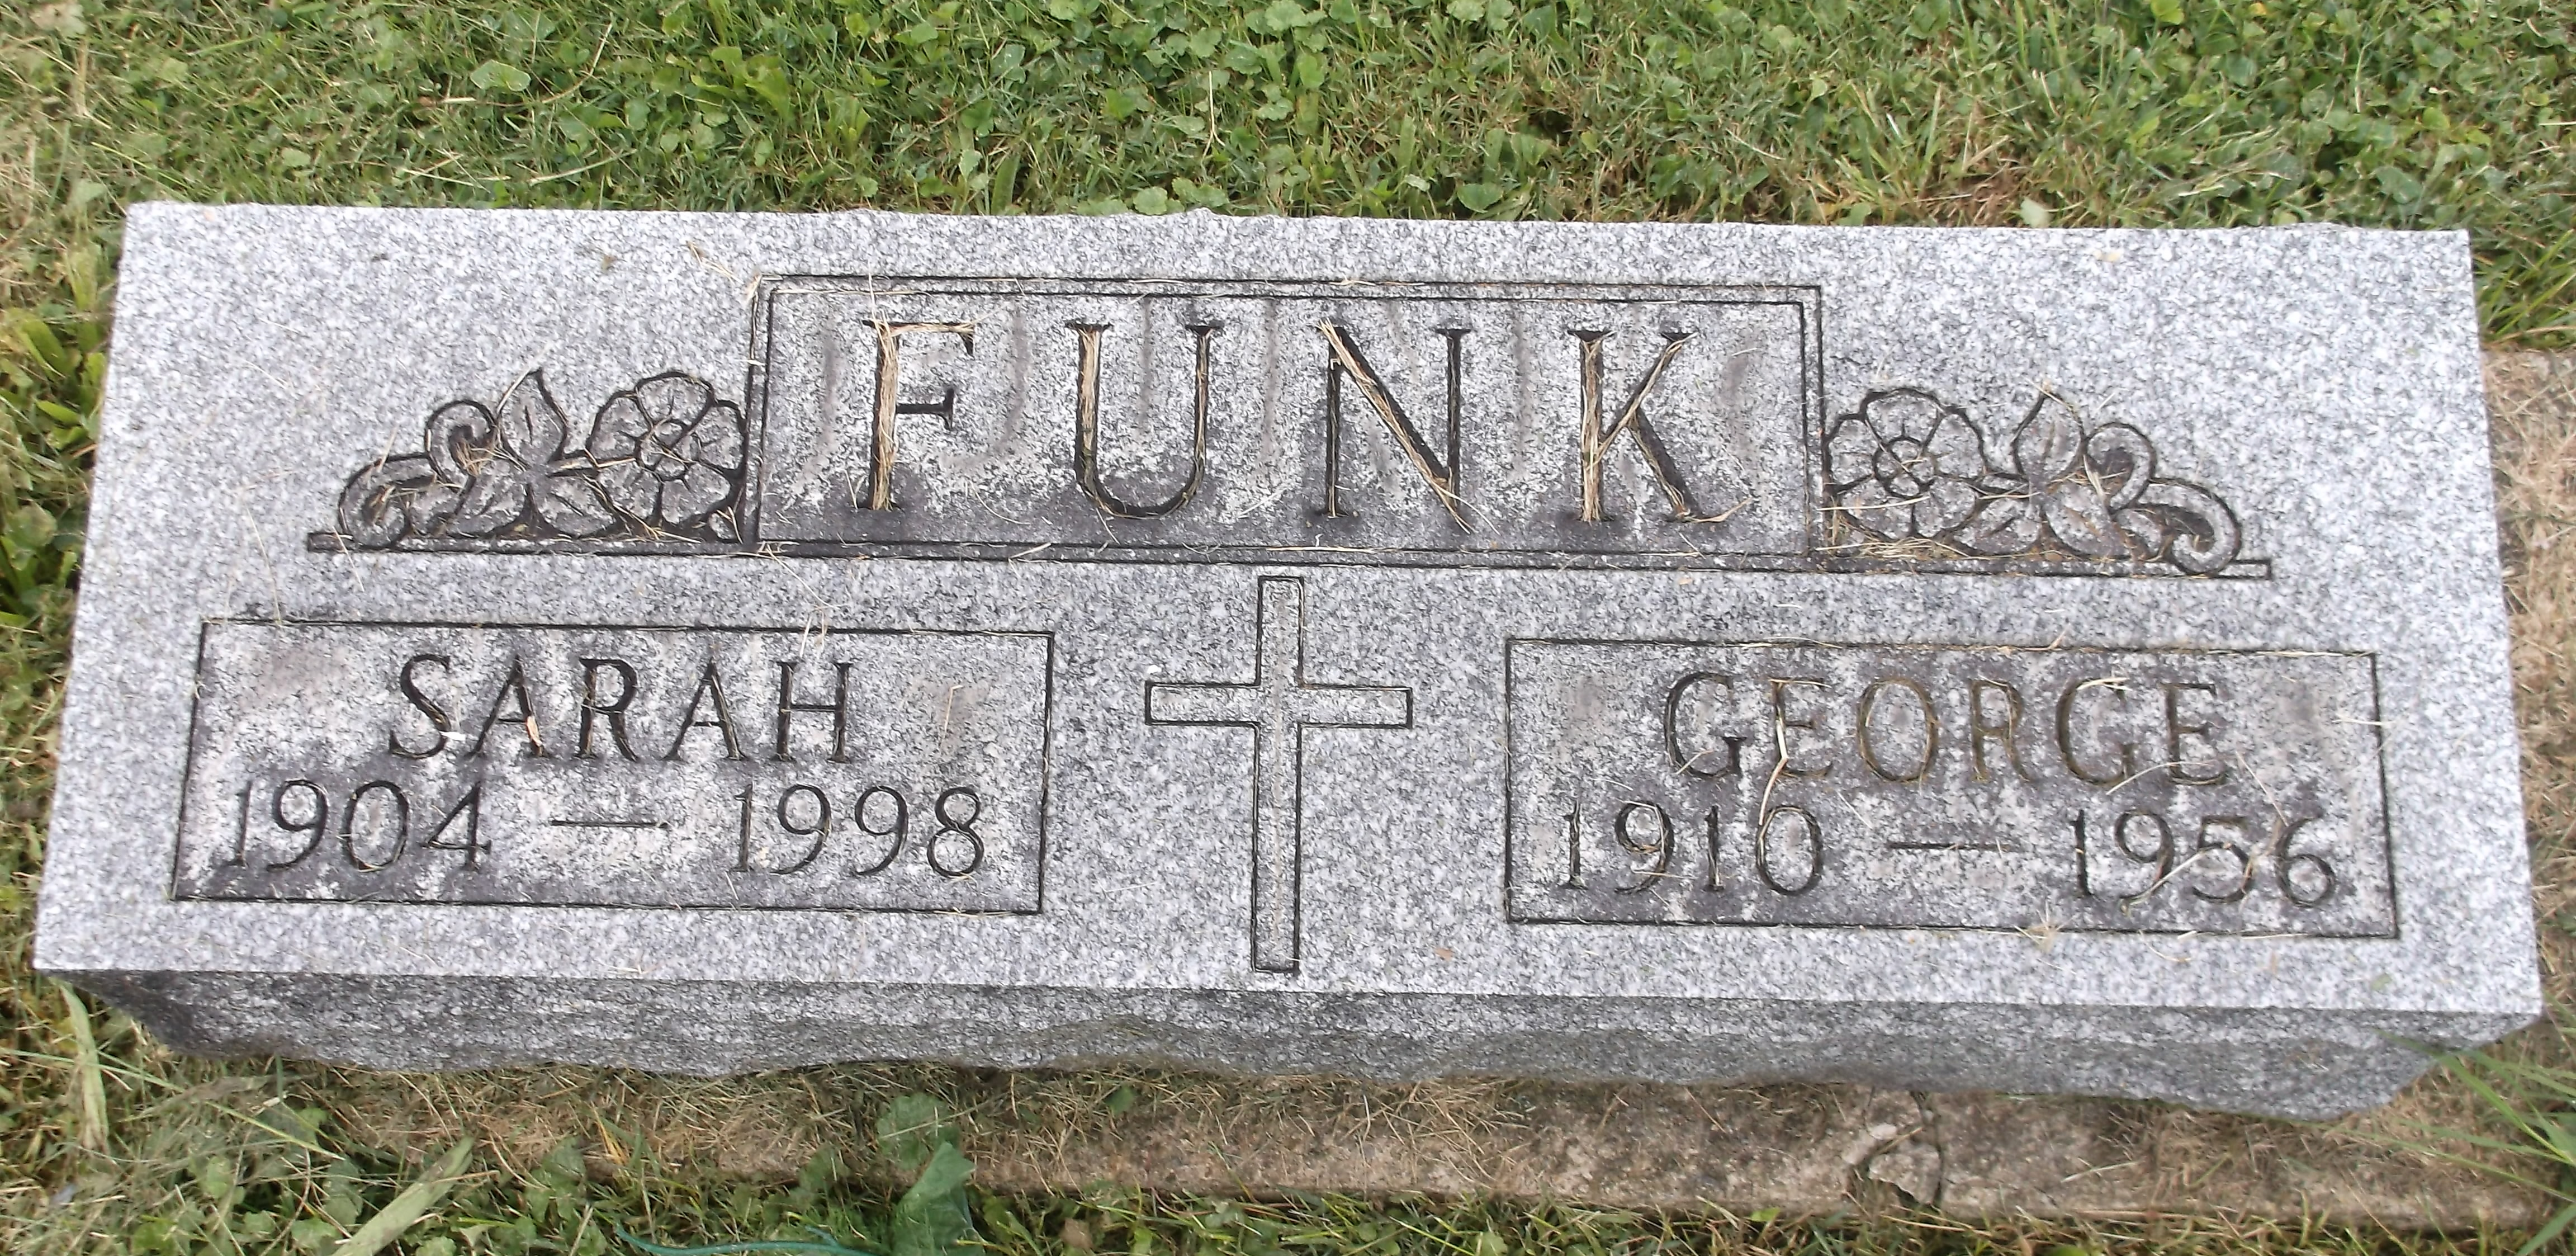 Sarah <i>Gordon</i> Funk